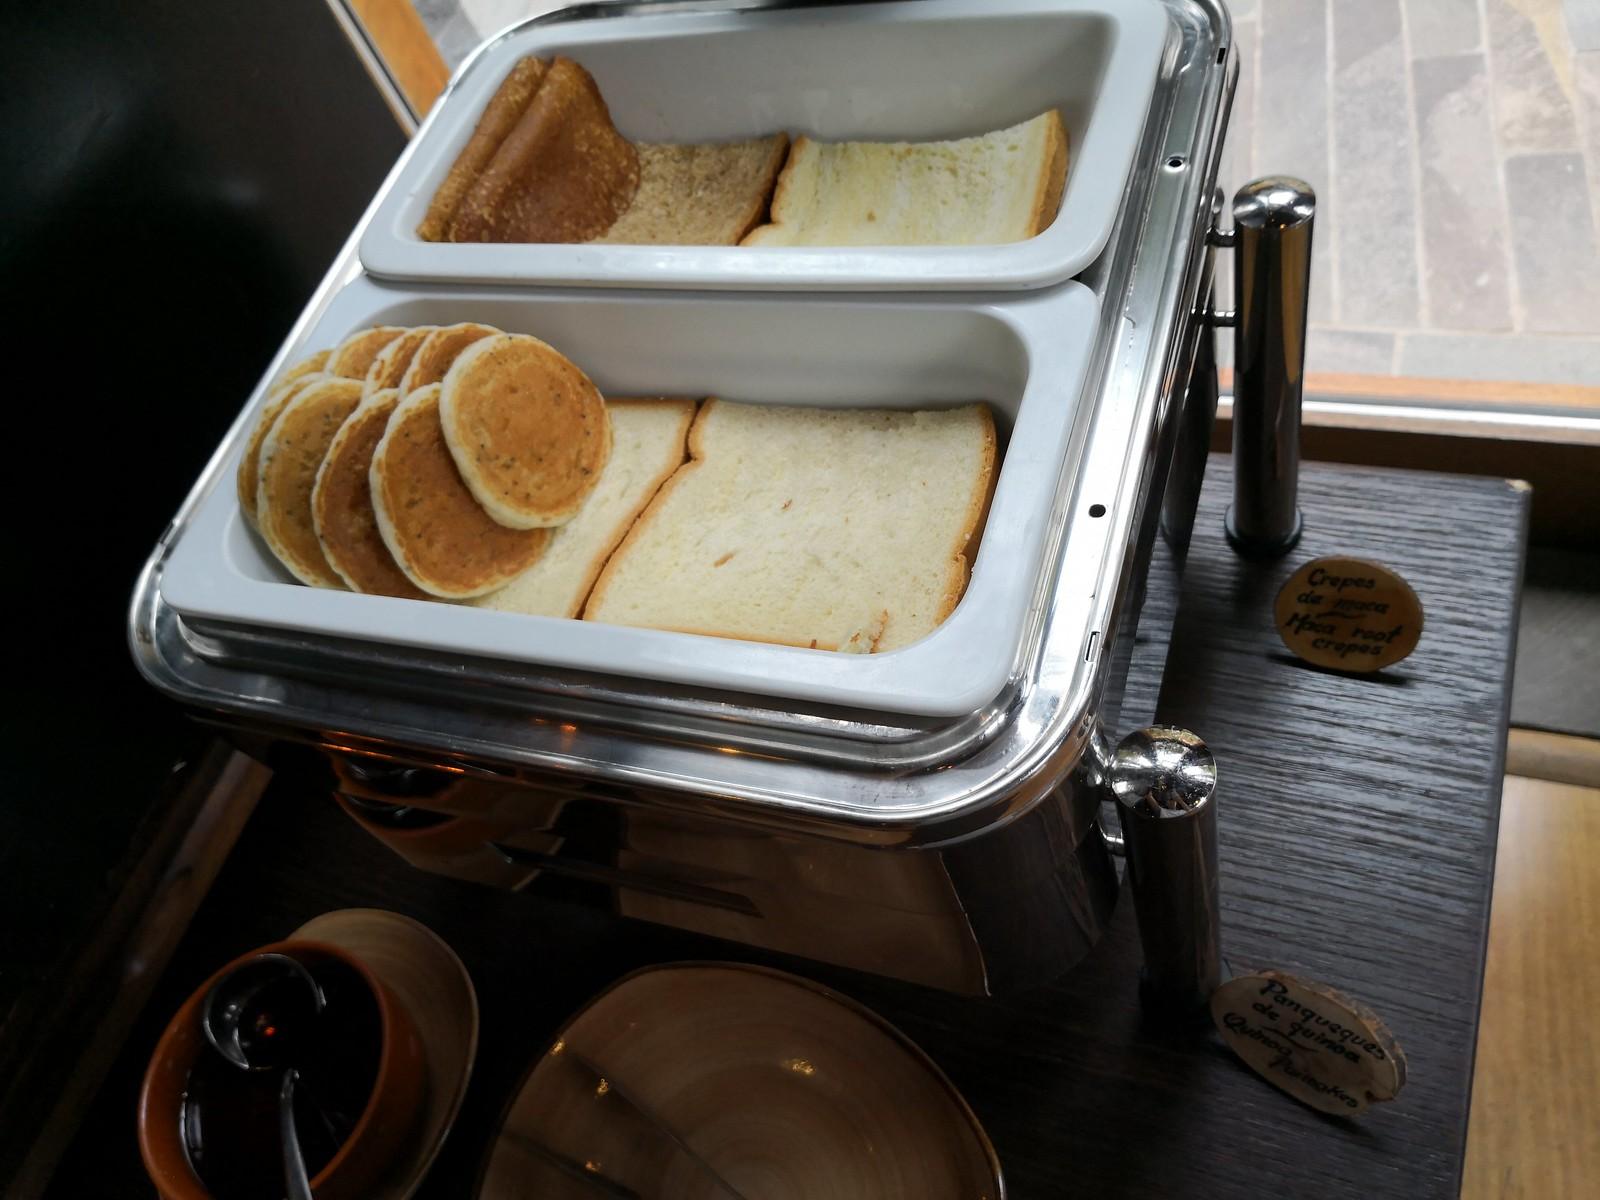 Pancake and crepe